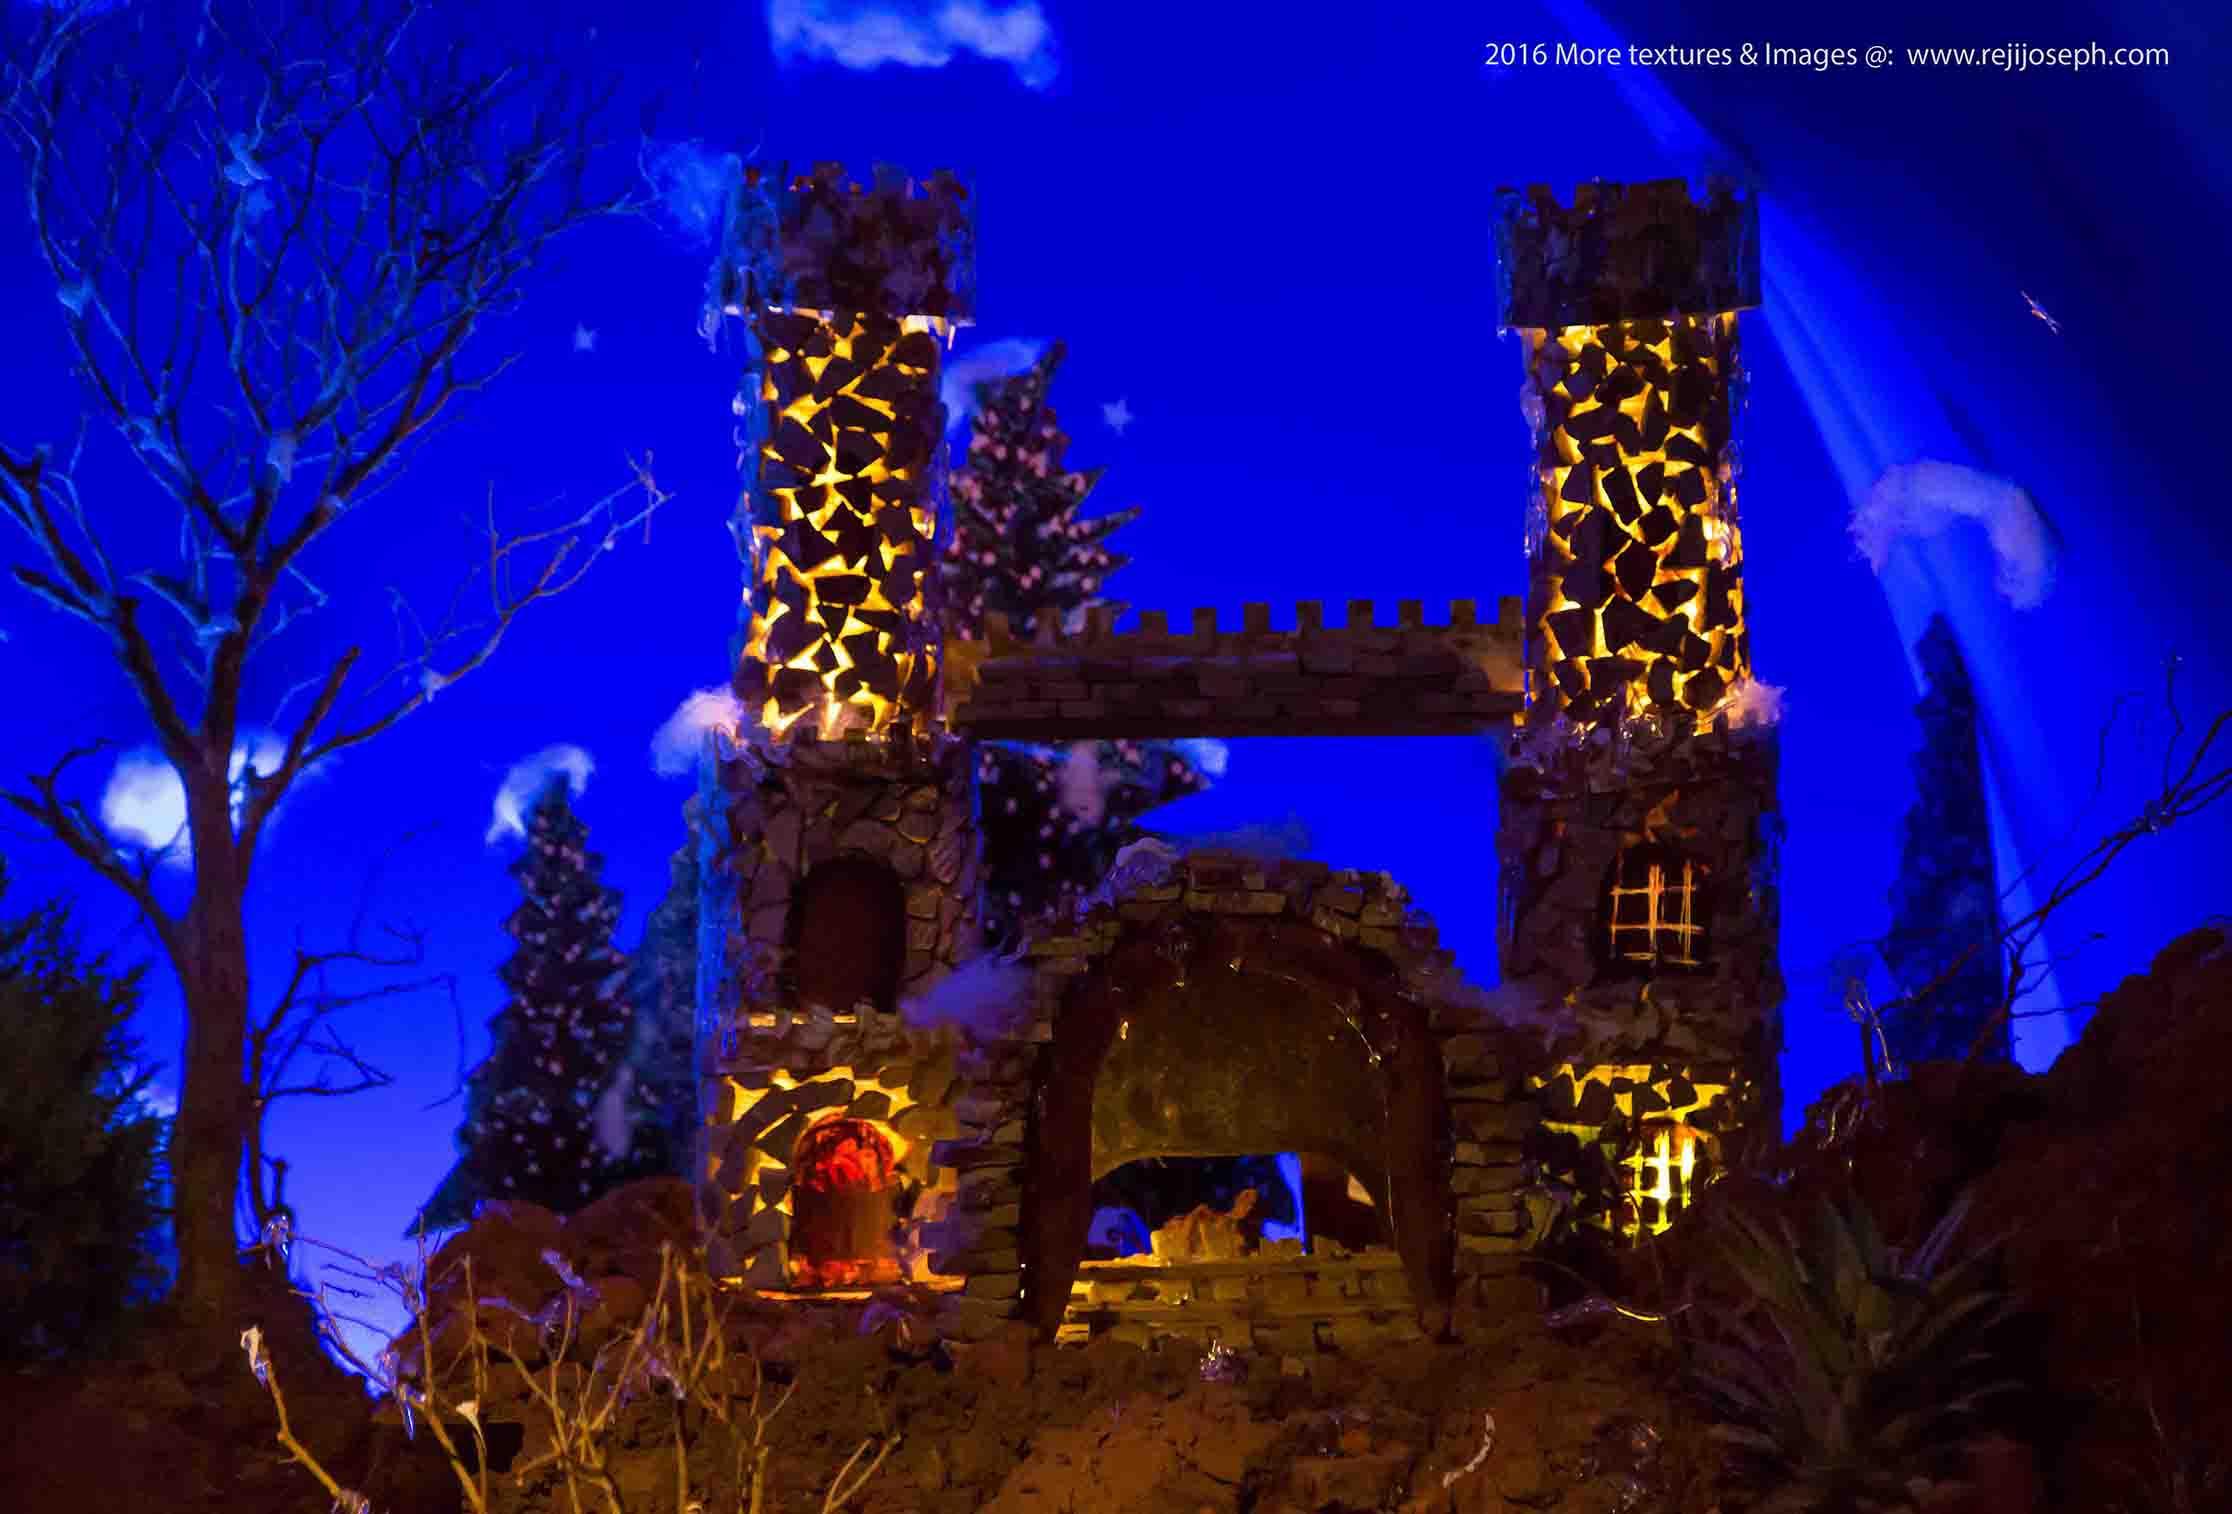 Christmas crib Pulkoodu St. George Forane Church Edappally 00016